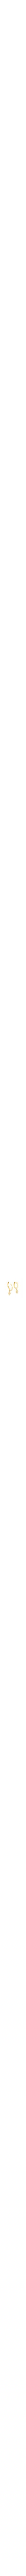 14k gold hamsa earrings elegant 14k gold Yellow